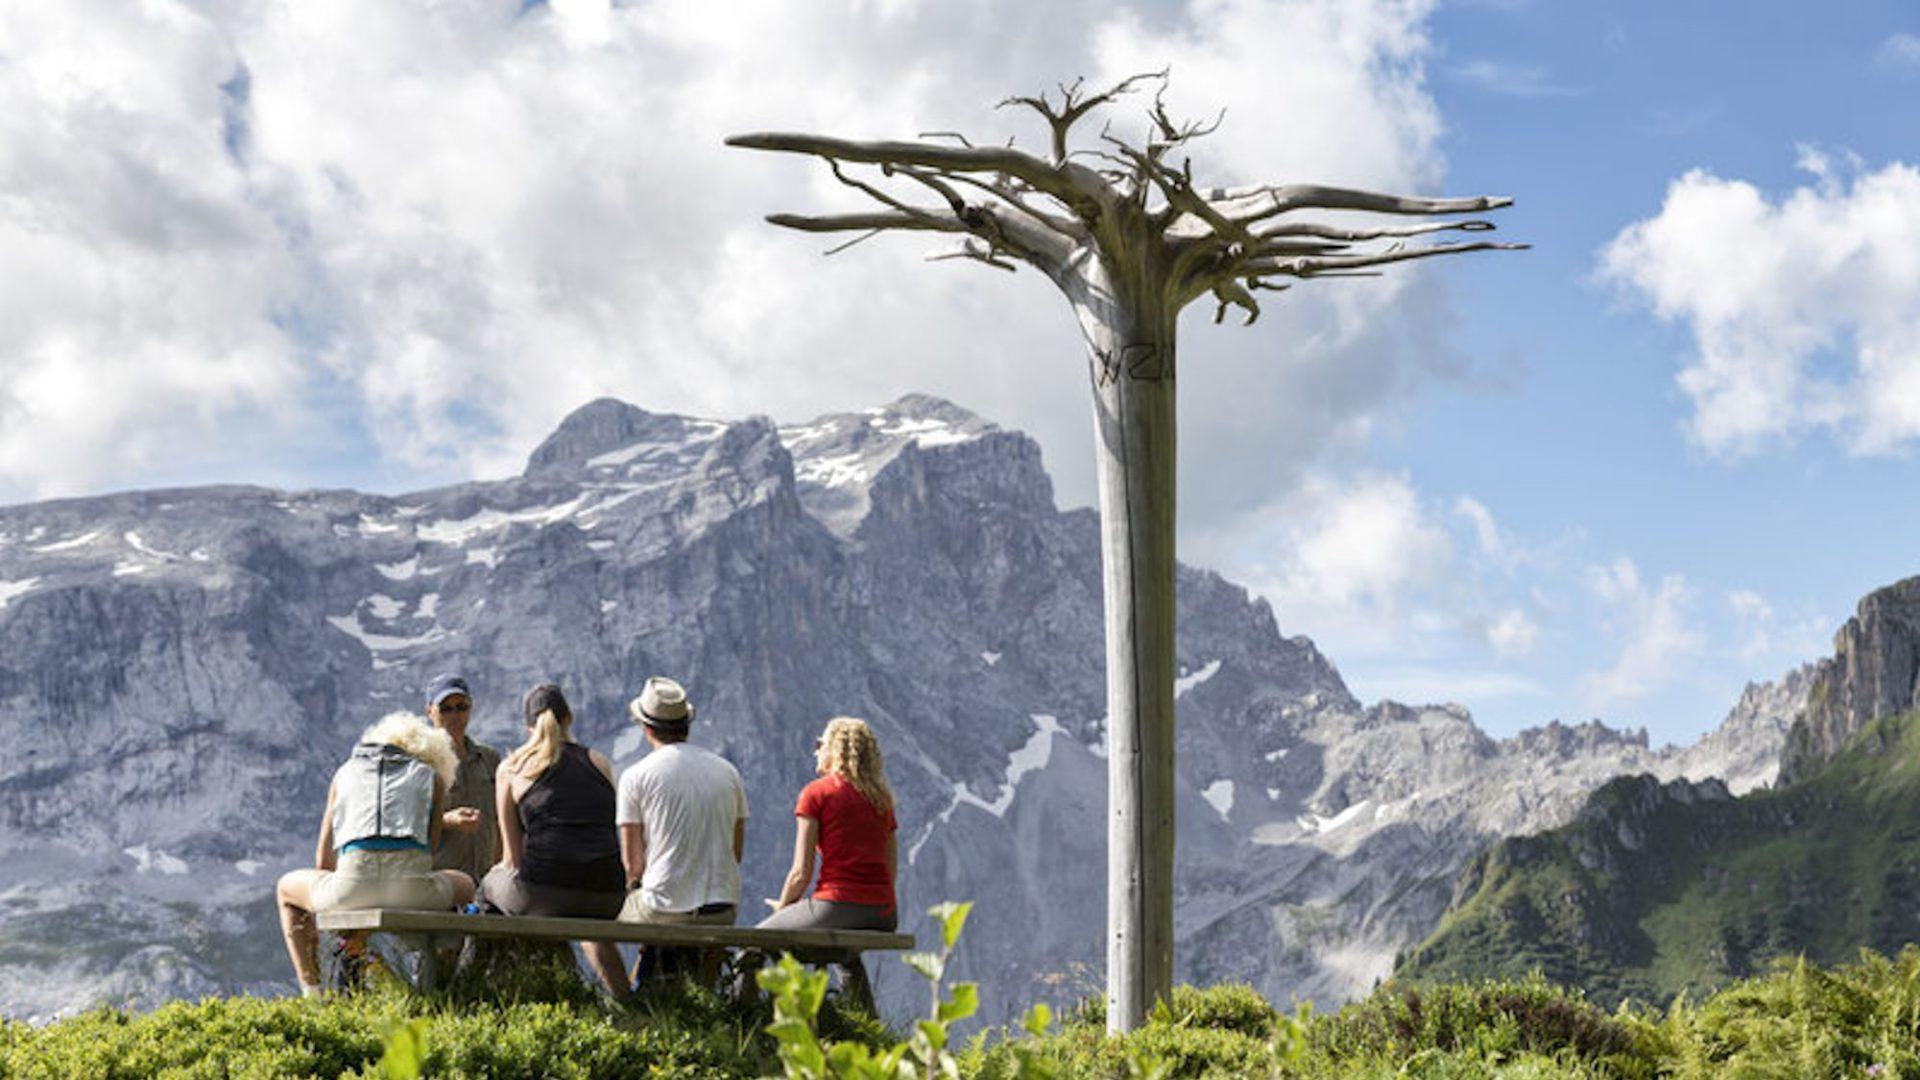 Gauertaler AlpKulTour, Wanderweg, Mythenbaum (c) Andreas Haller / Montafon Tourismus GmbH